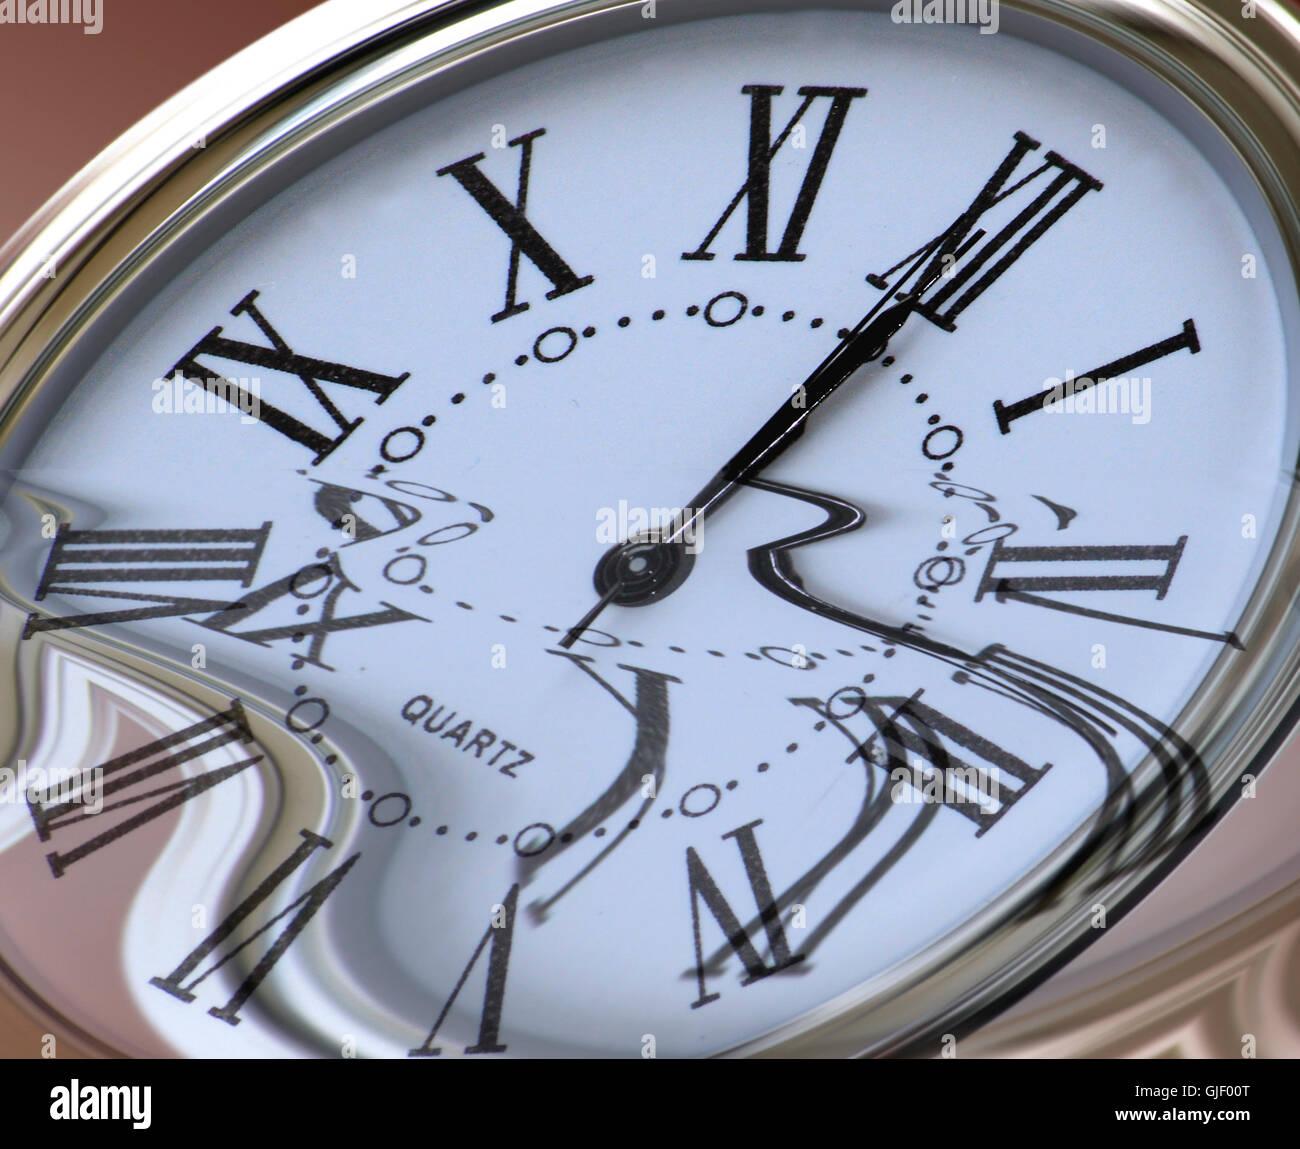 elapsed time - Stock Image